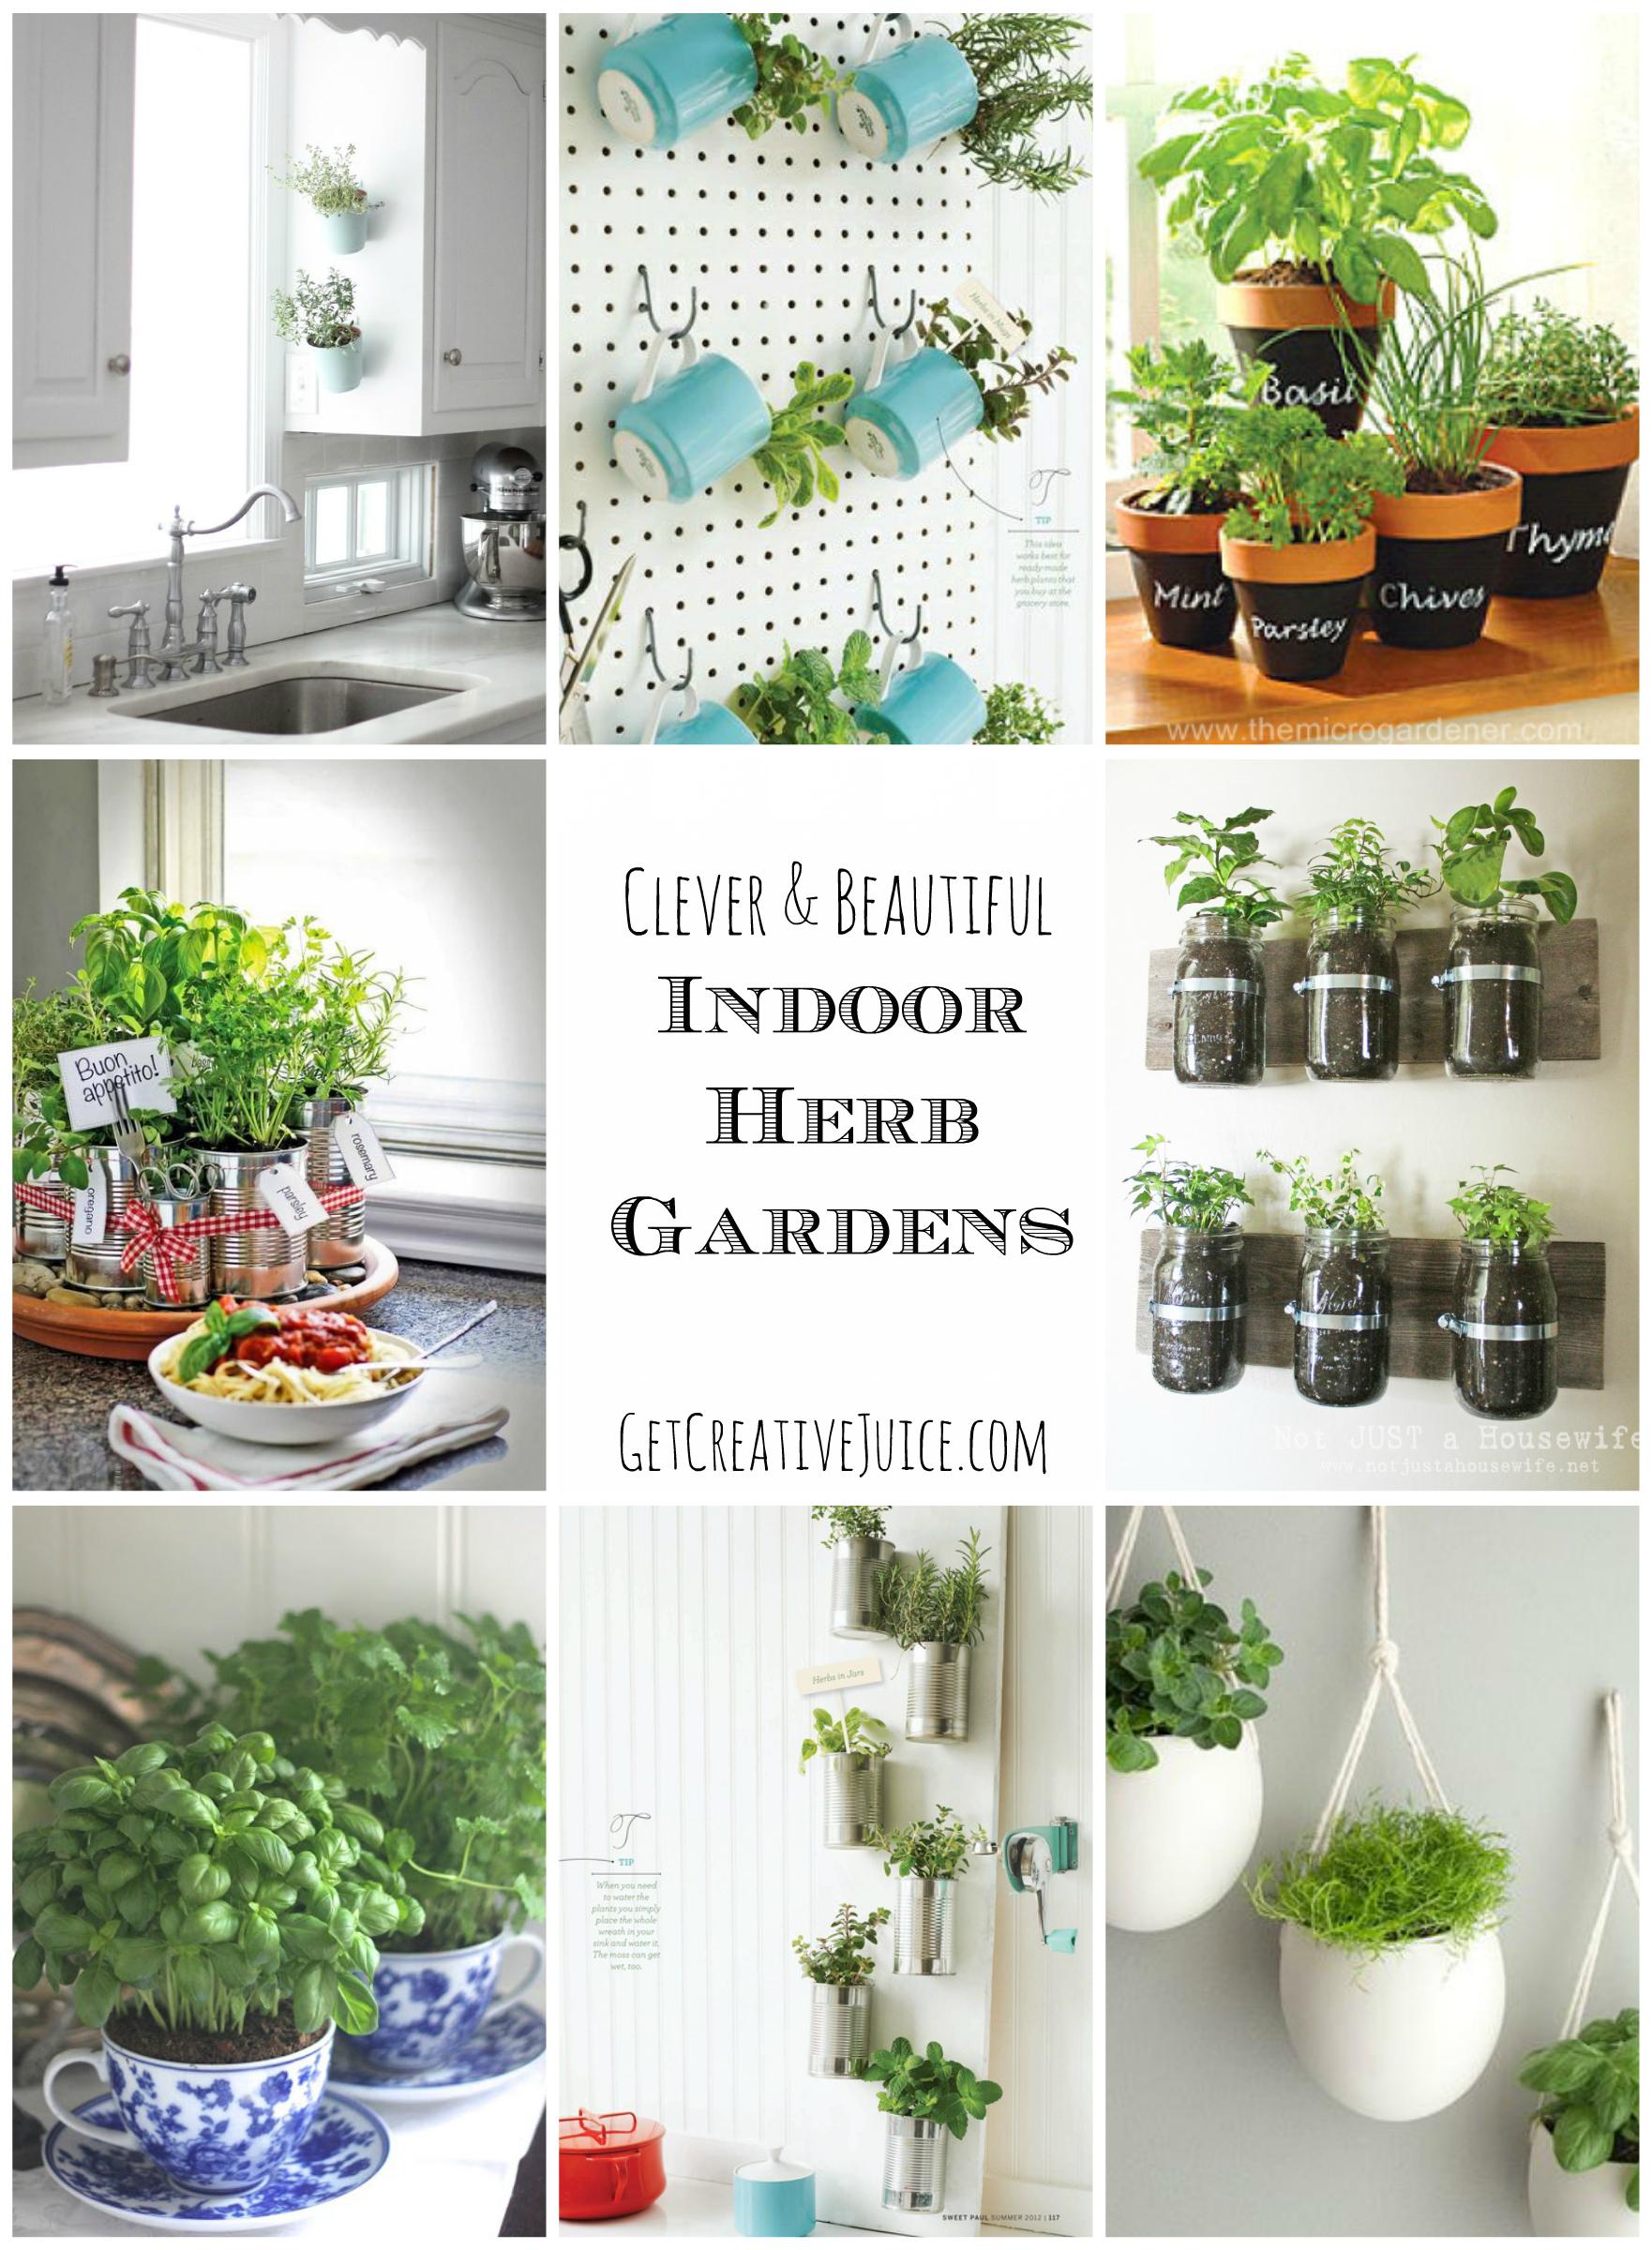 Simphome.com indoor herb garden ideas creative juice with relevant ideas for 2020